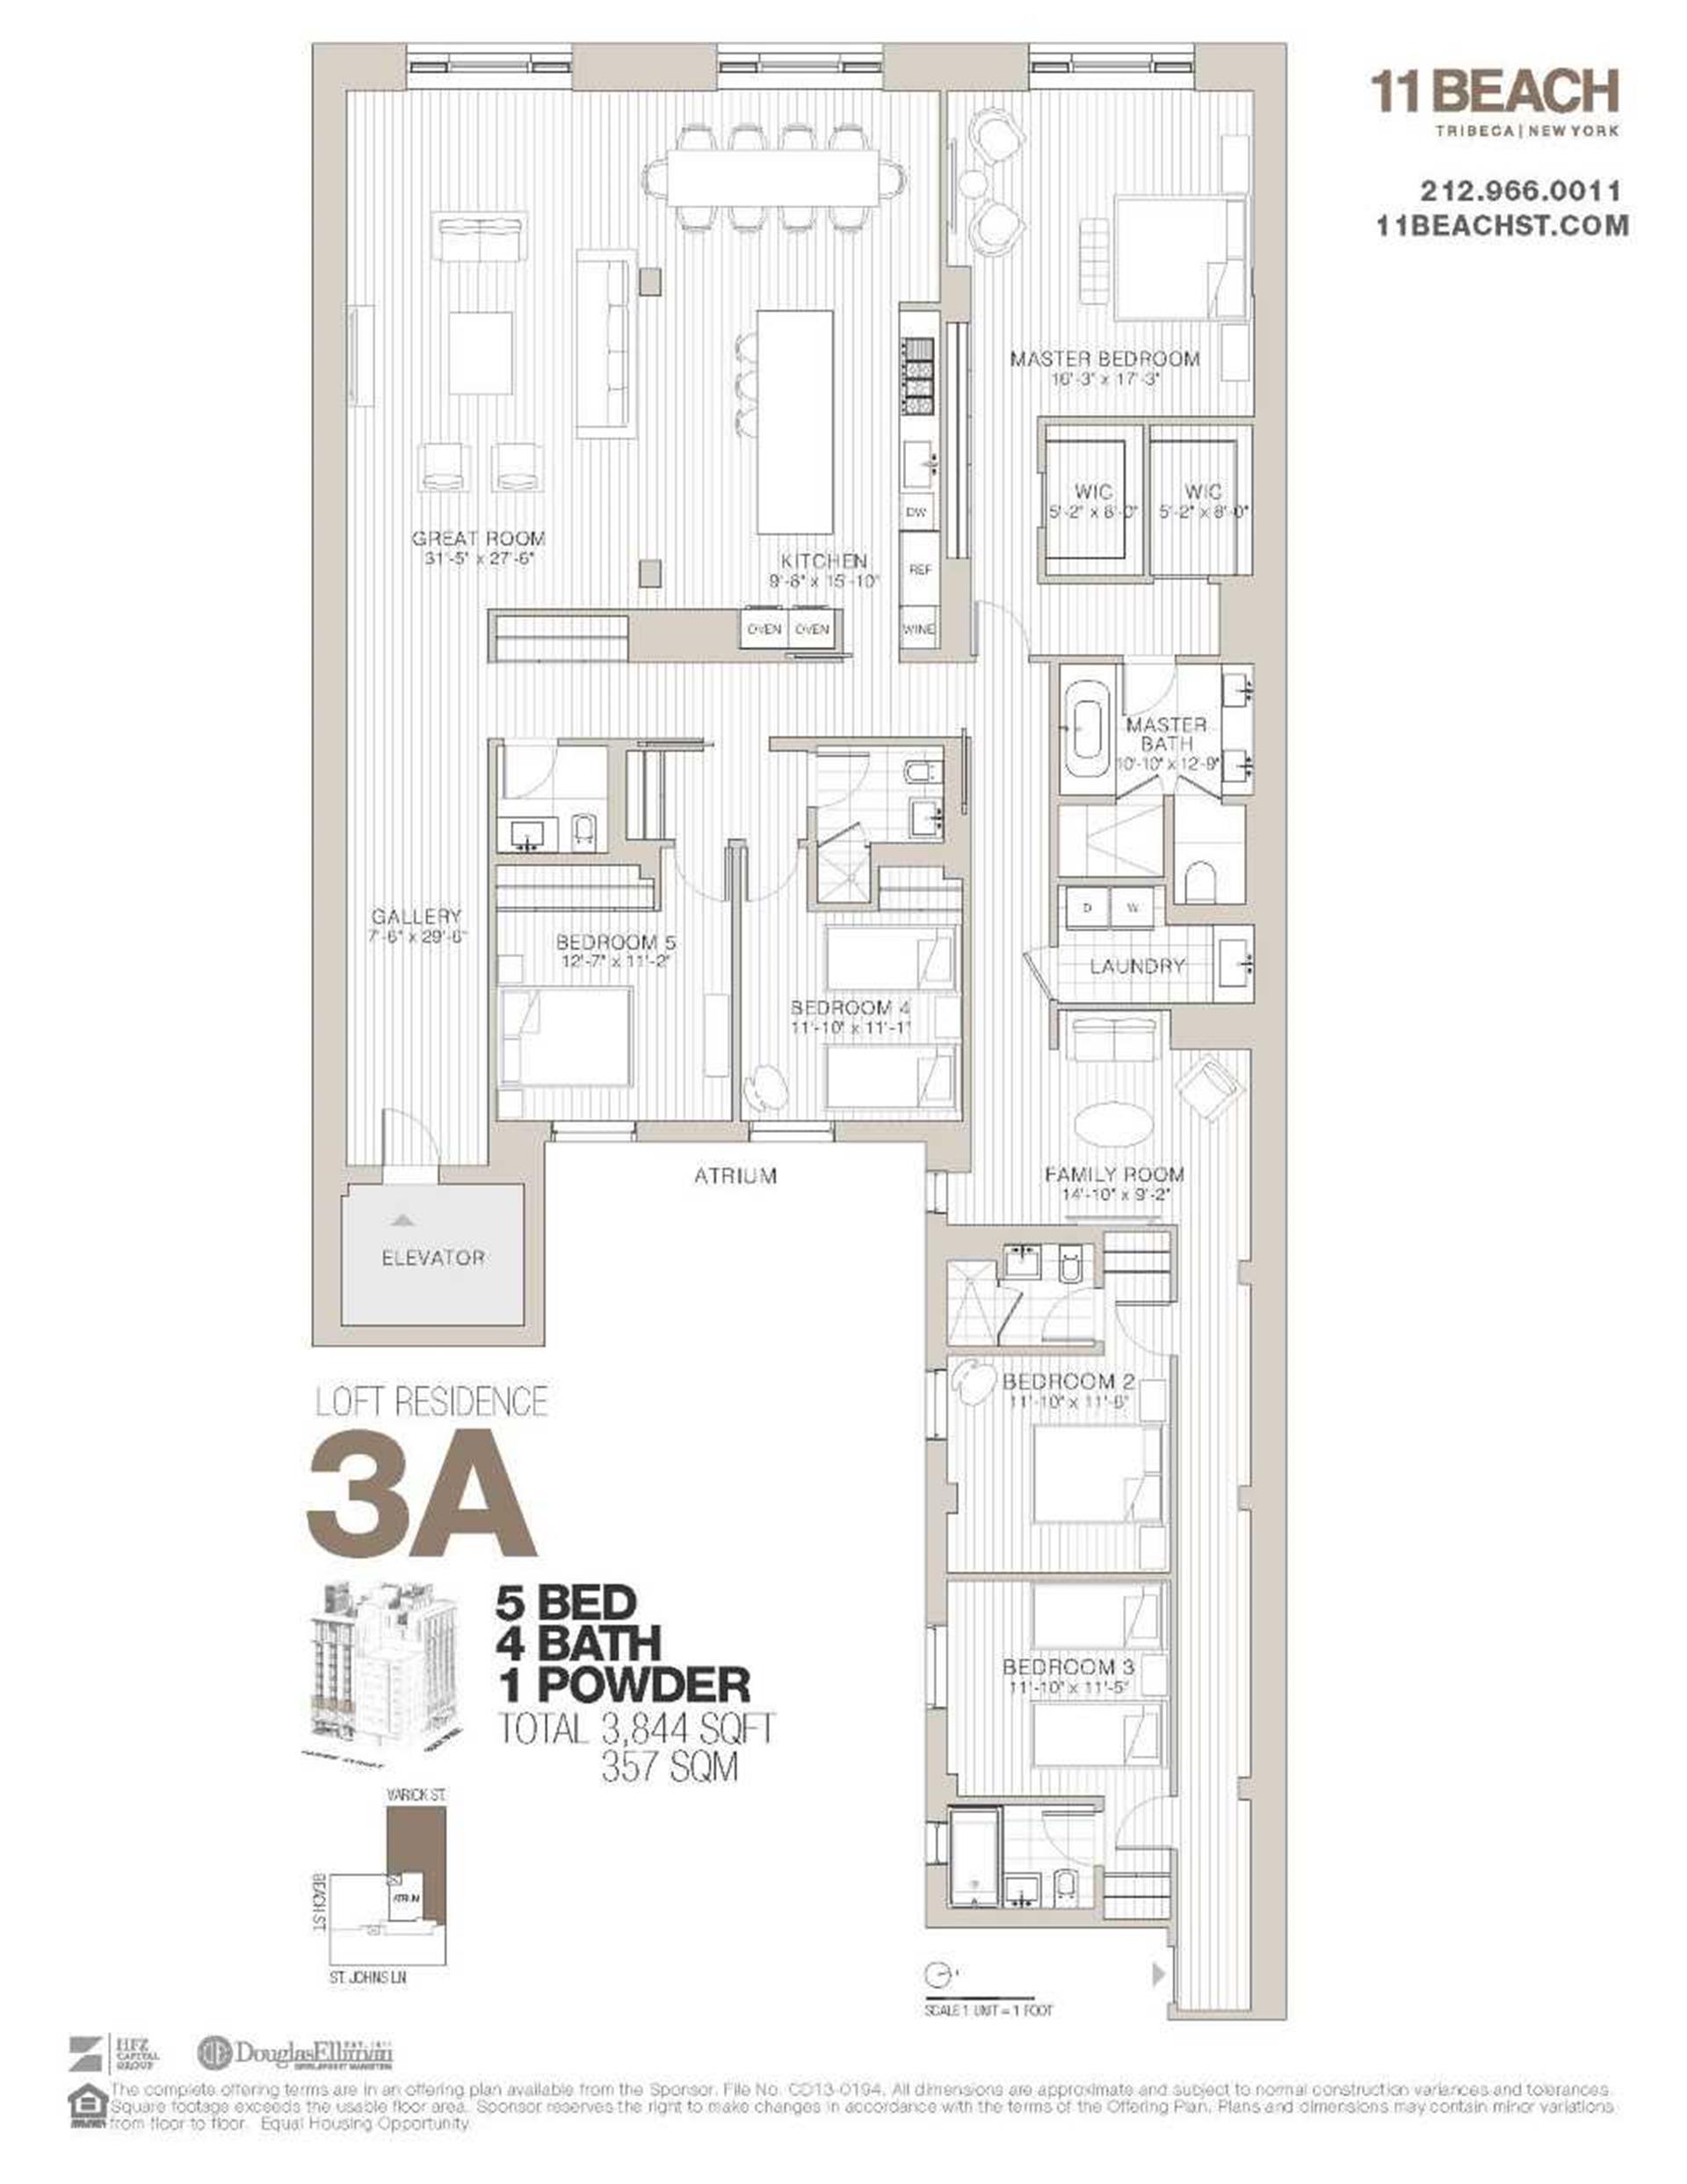 Floor plan of 11 Beach St, 3A - TriBeCa, New York